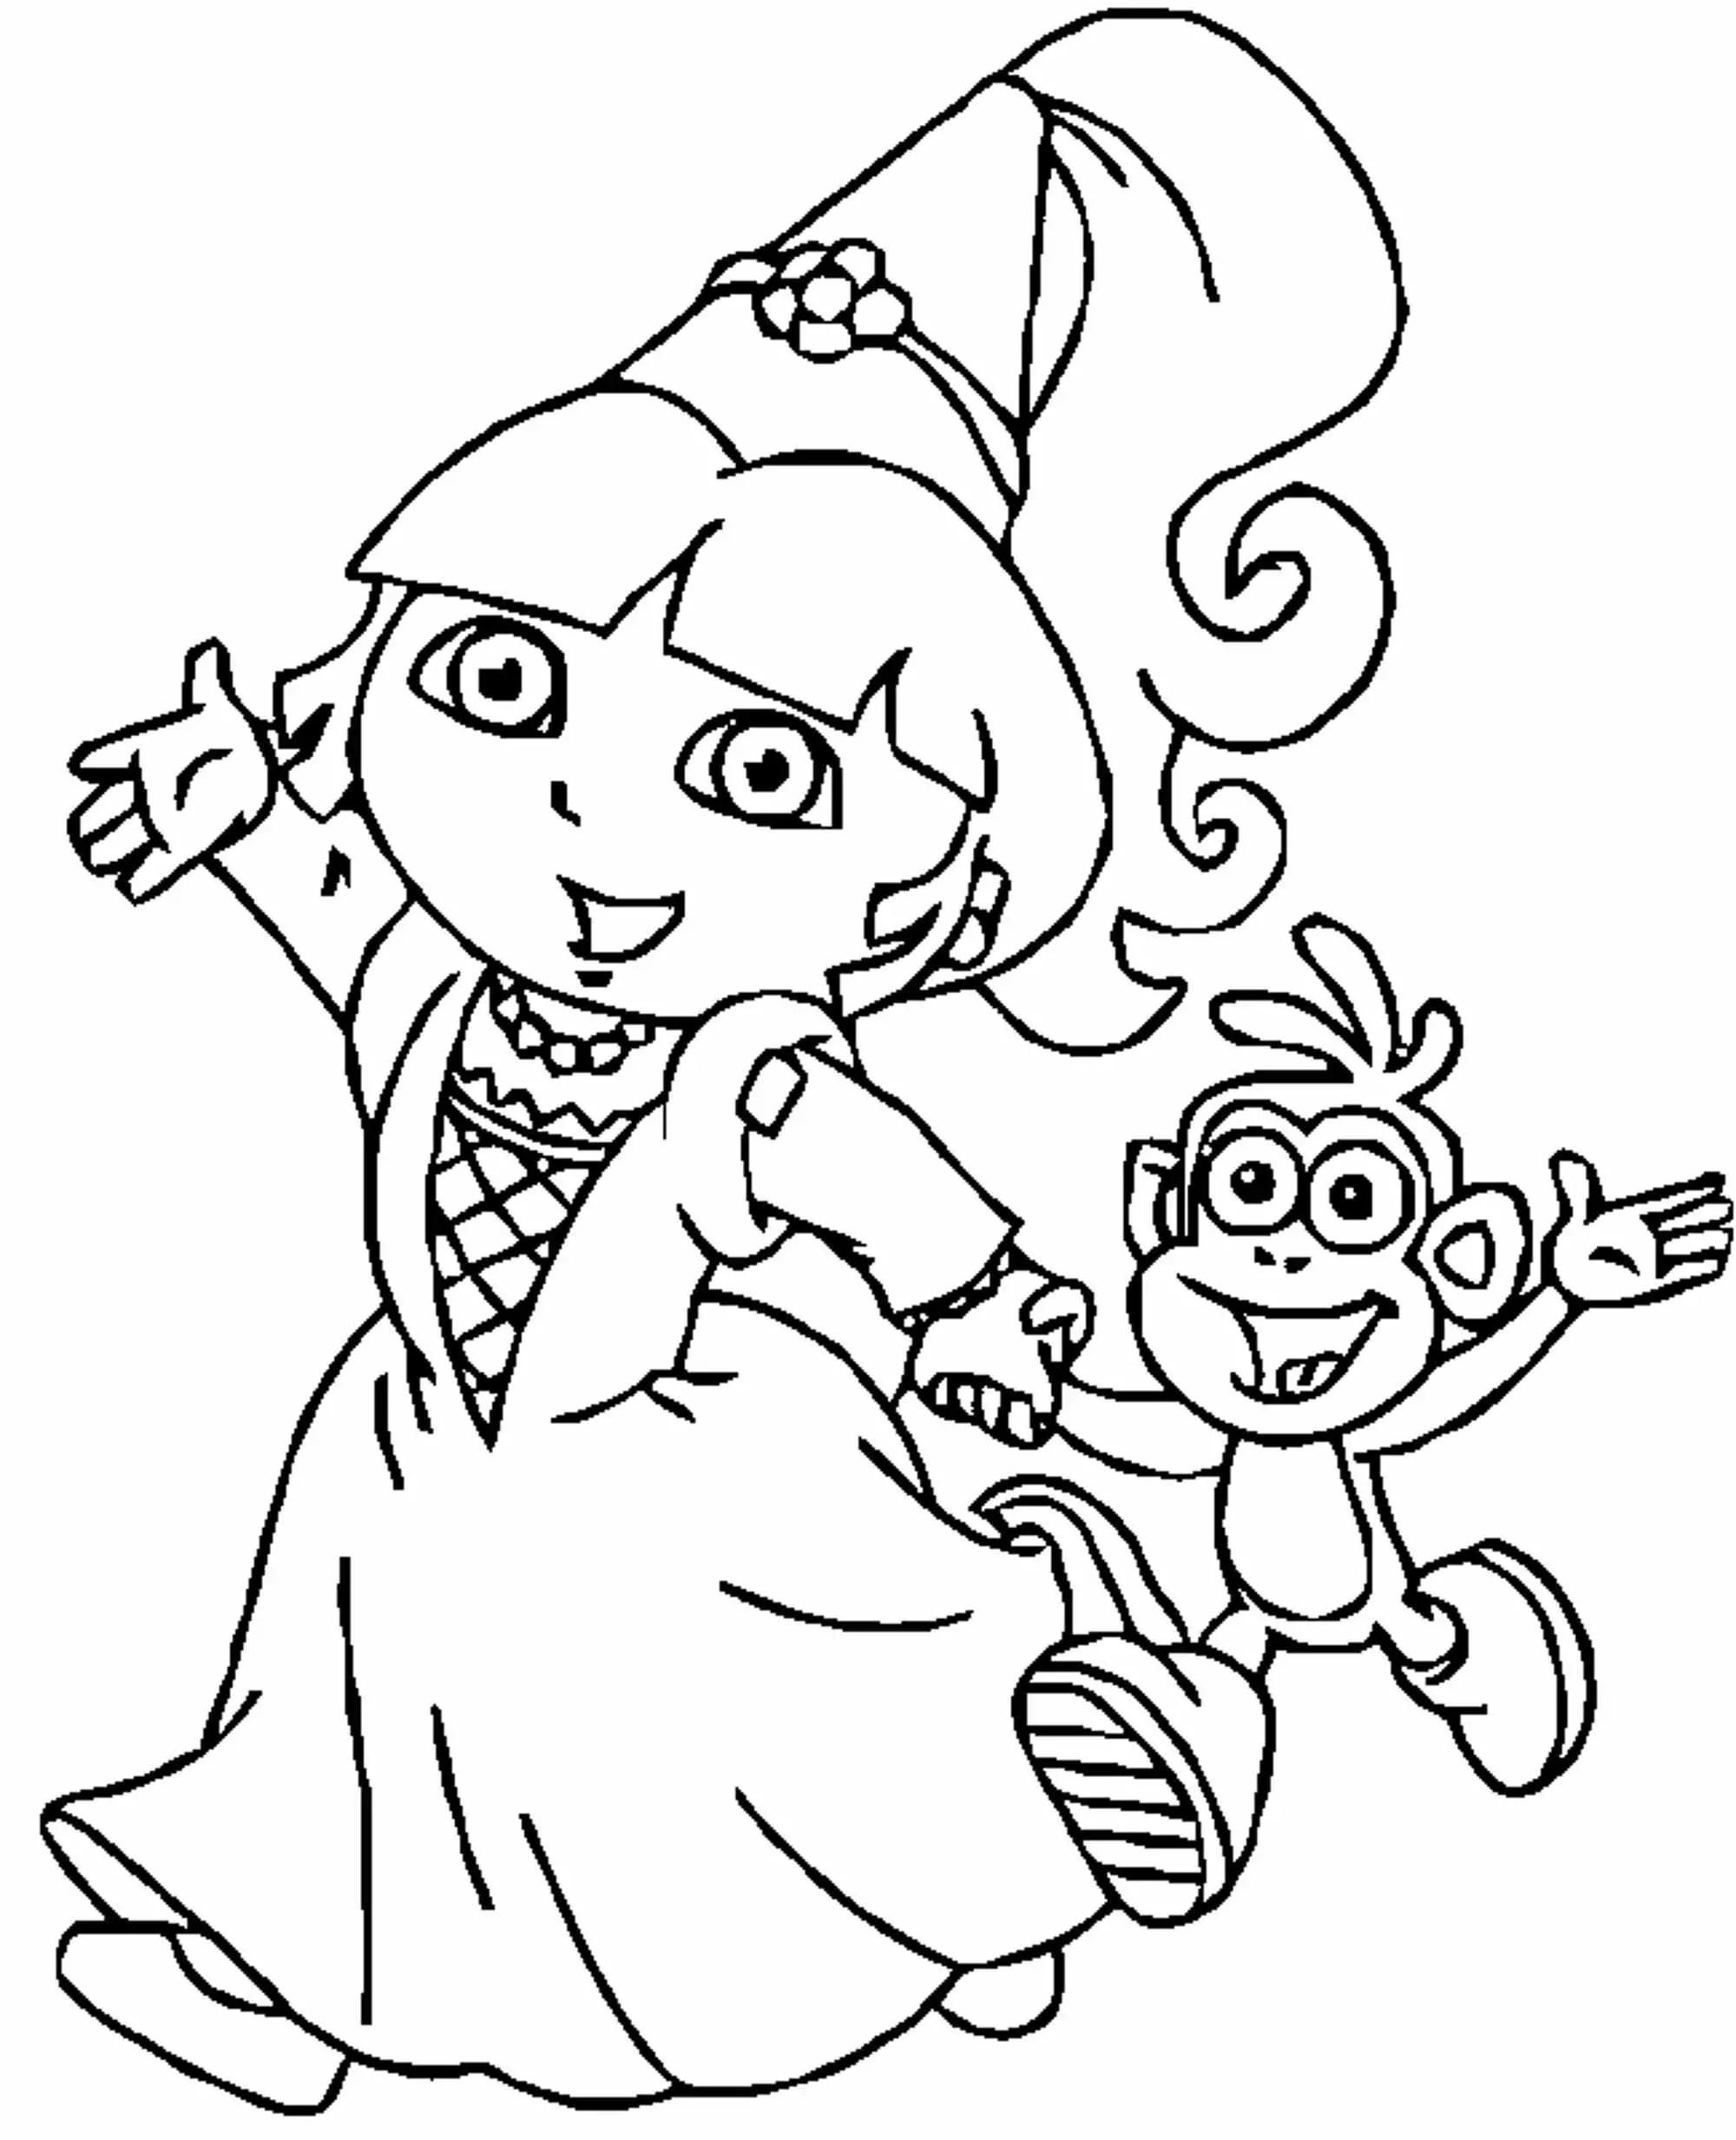 Princess Dora The Explorer Coloring Page Wecoloringpagecom